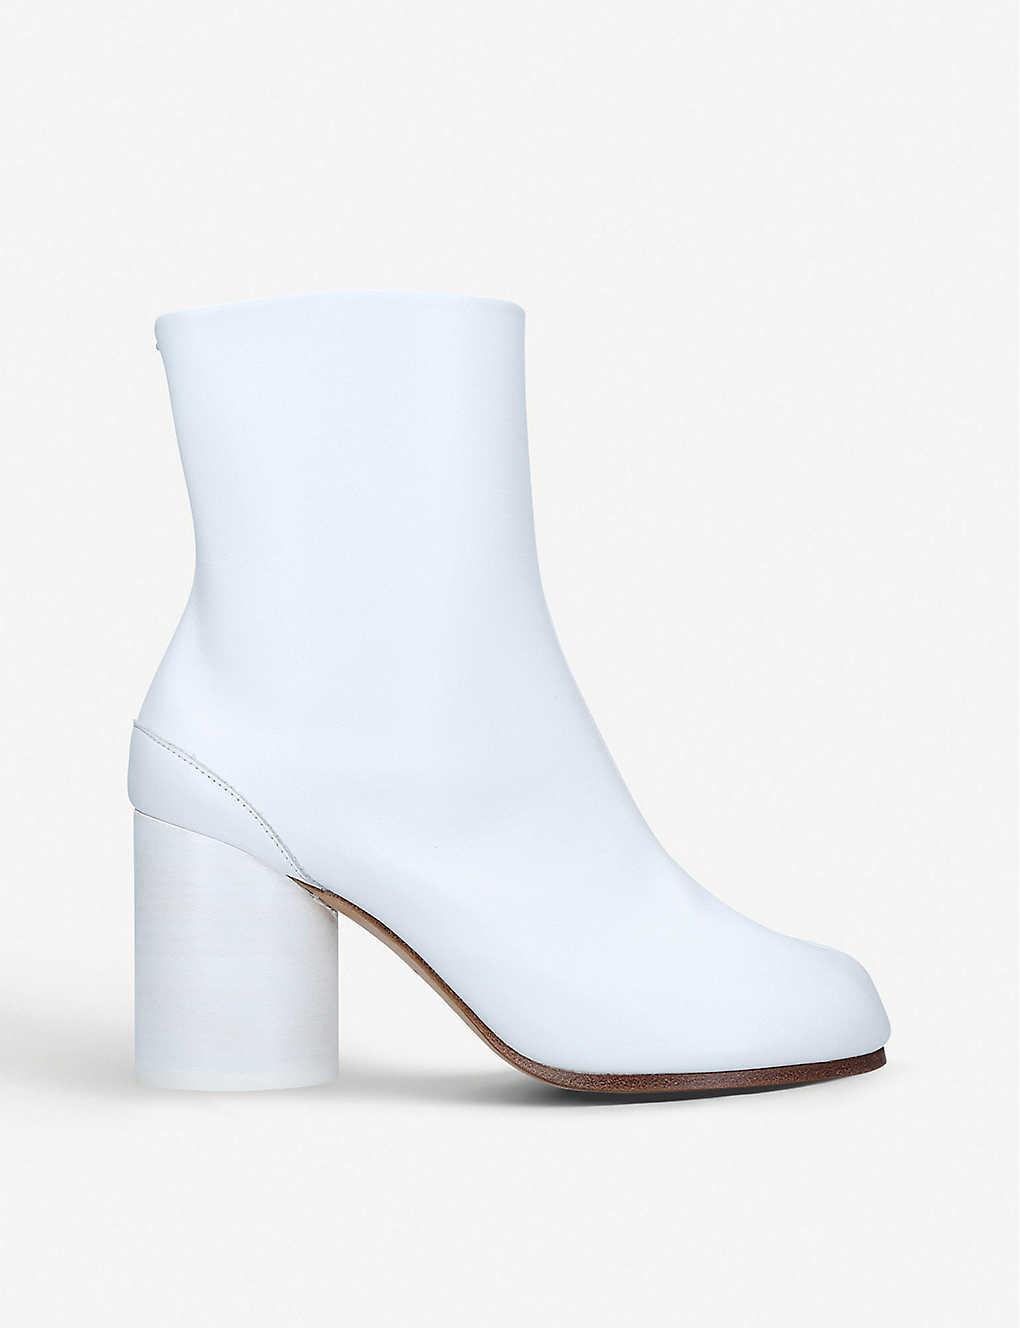 Maison Margiela Tabi Leather Split-toe Boot In White